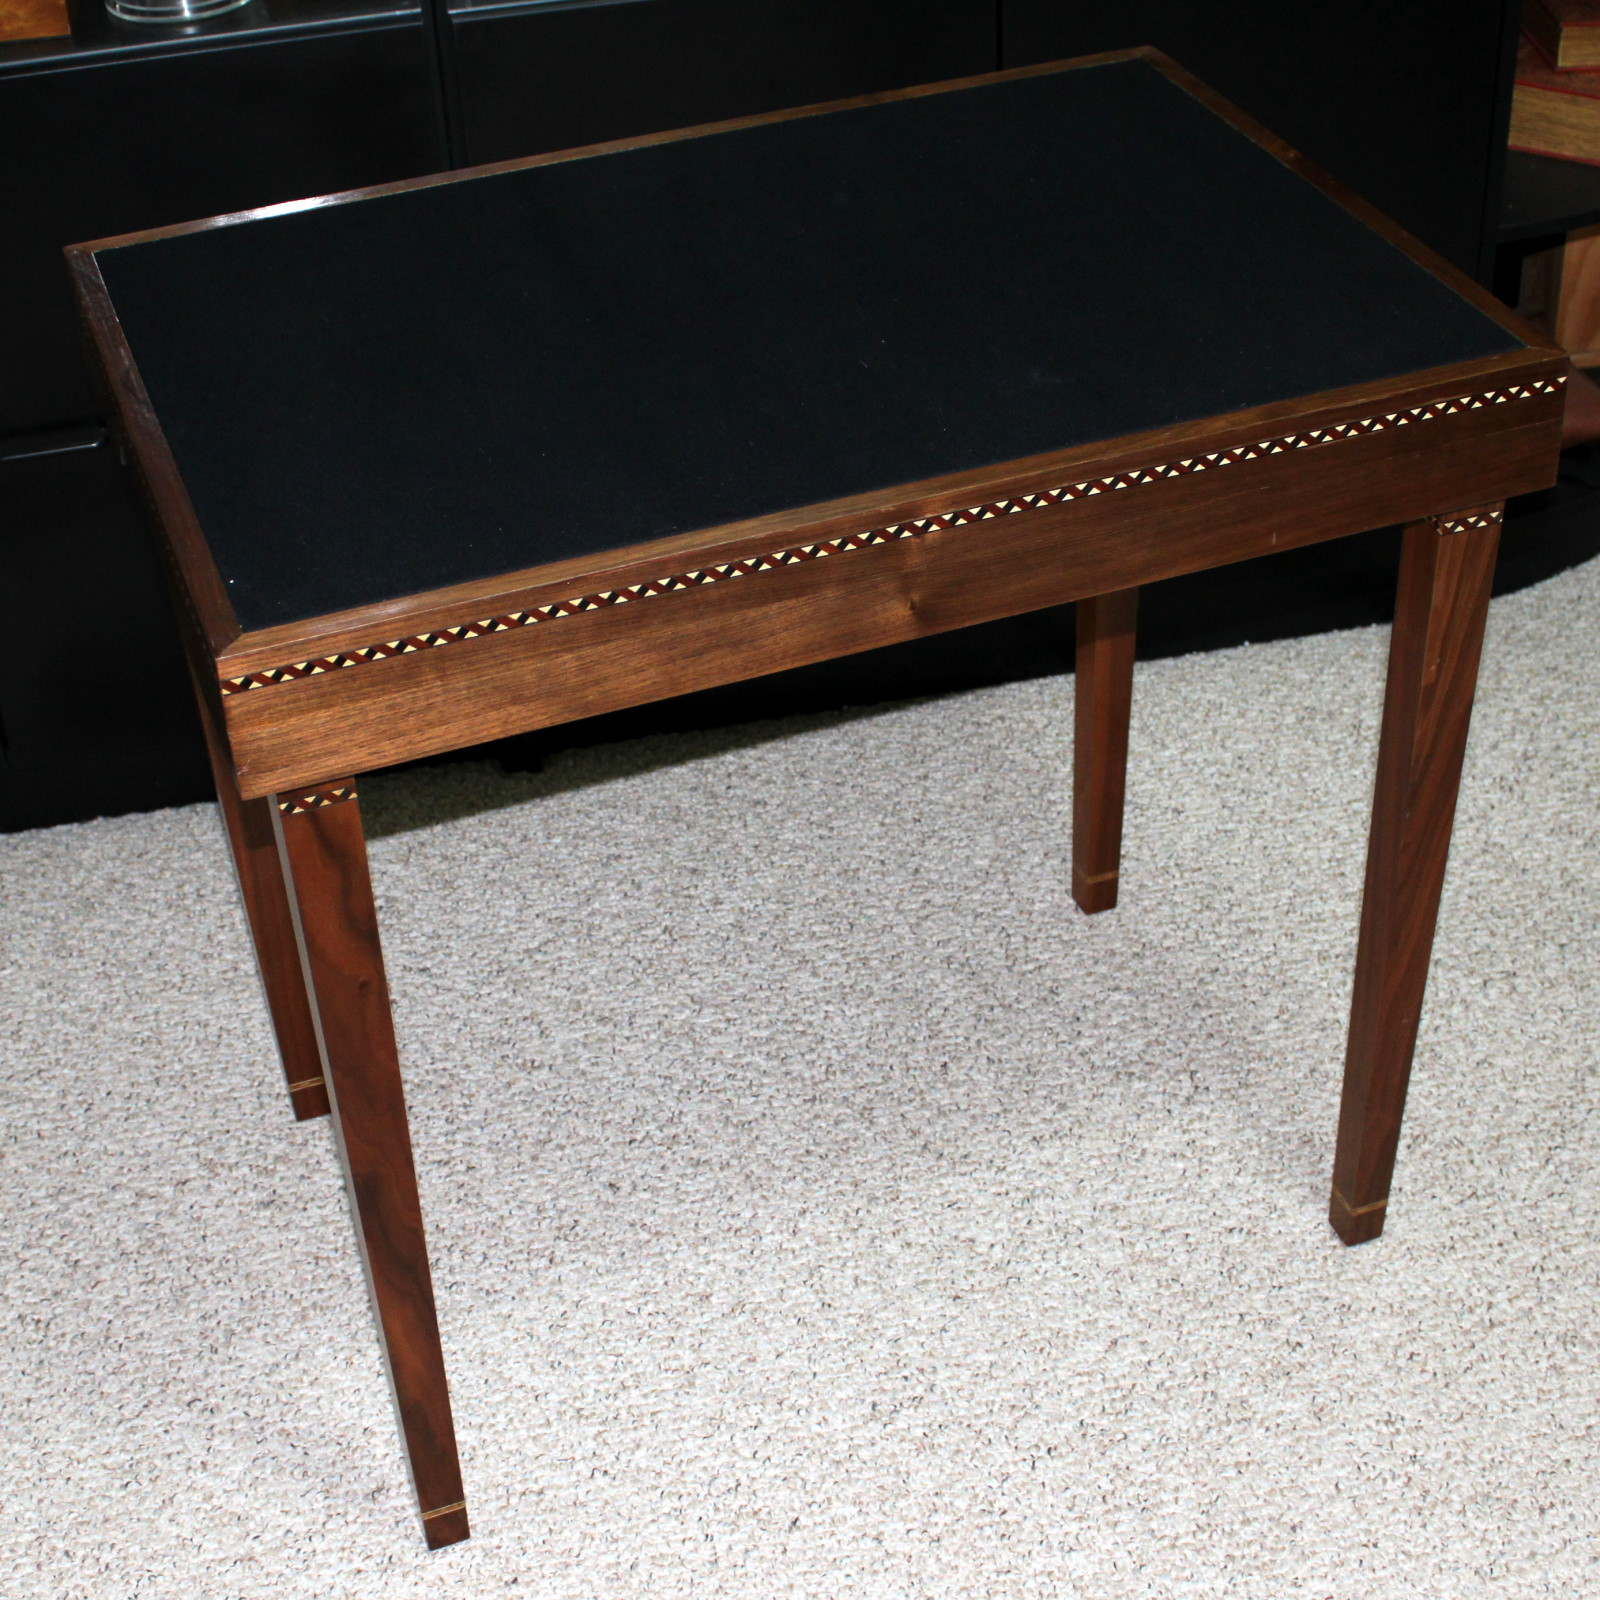 Comedy Table Legs by Woodmagic Studio